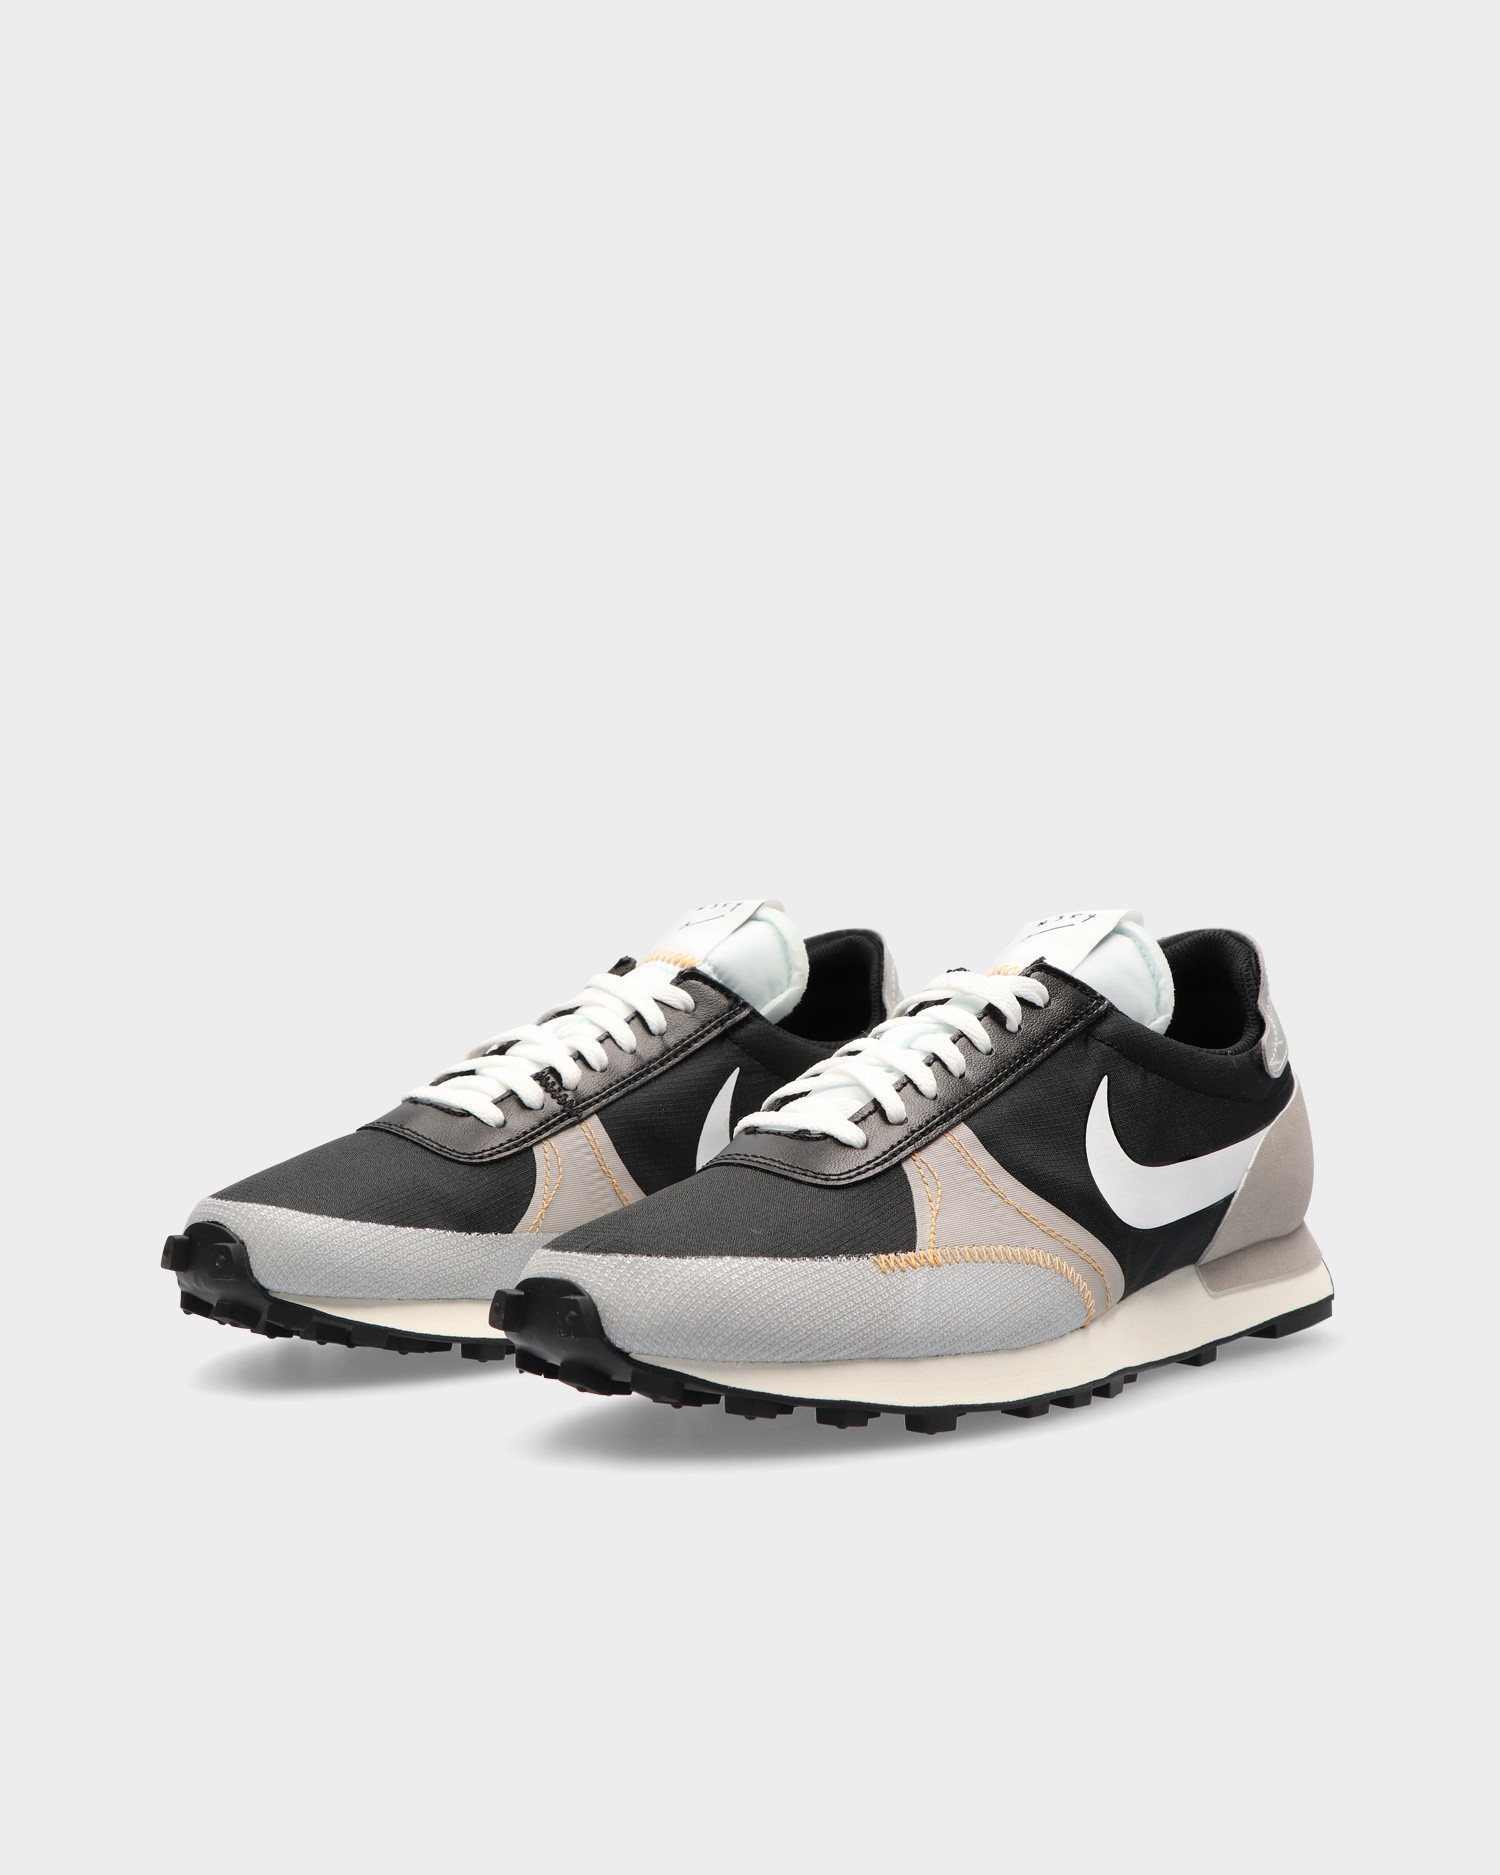 Nike dbreak-type Black/white-grey fog-college grey